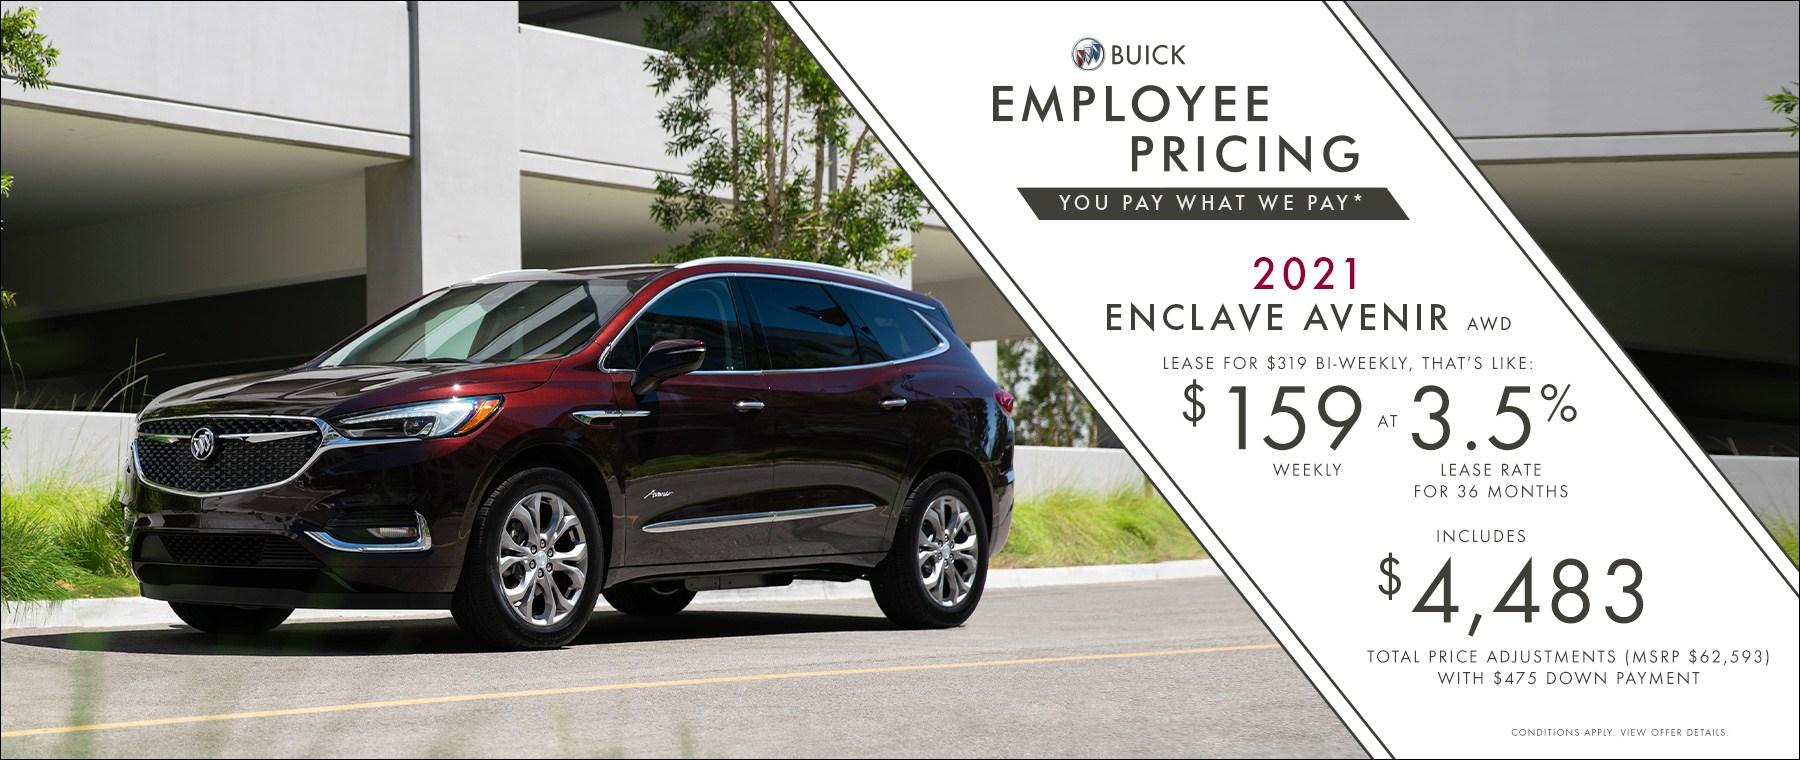 Employee Pricing – 2021 Enclave Avenir AWD